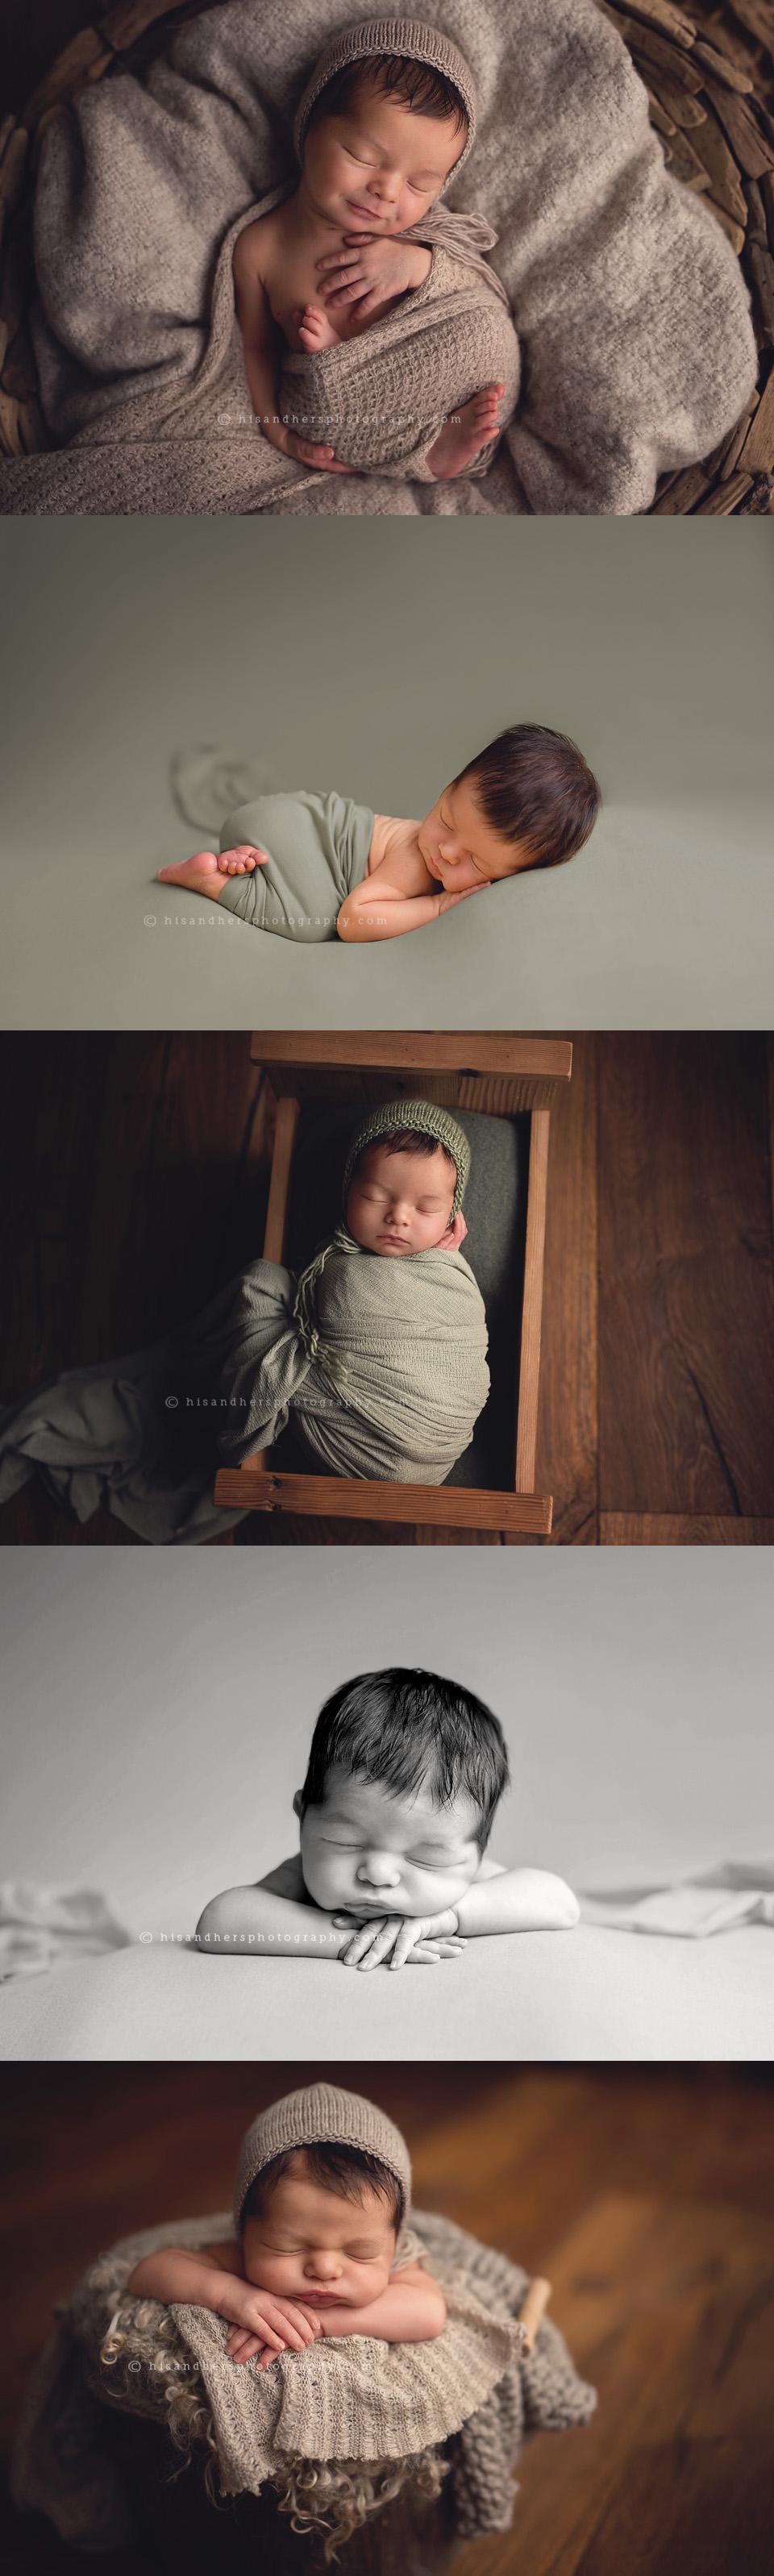 des moines iowa newborn photographer photography